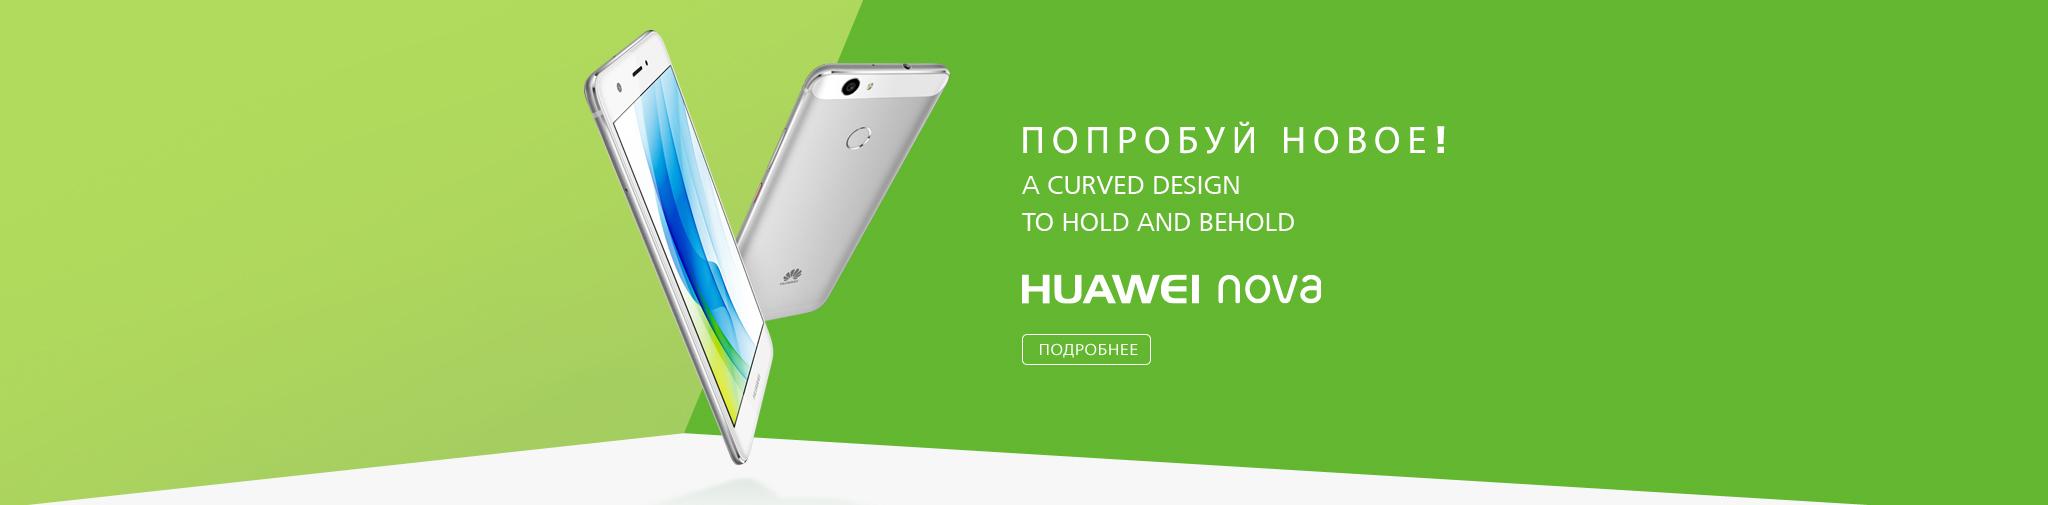 Huawei nova комплект